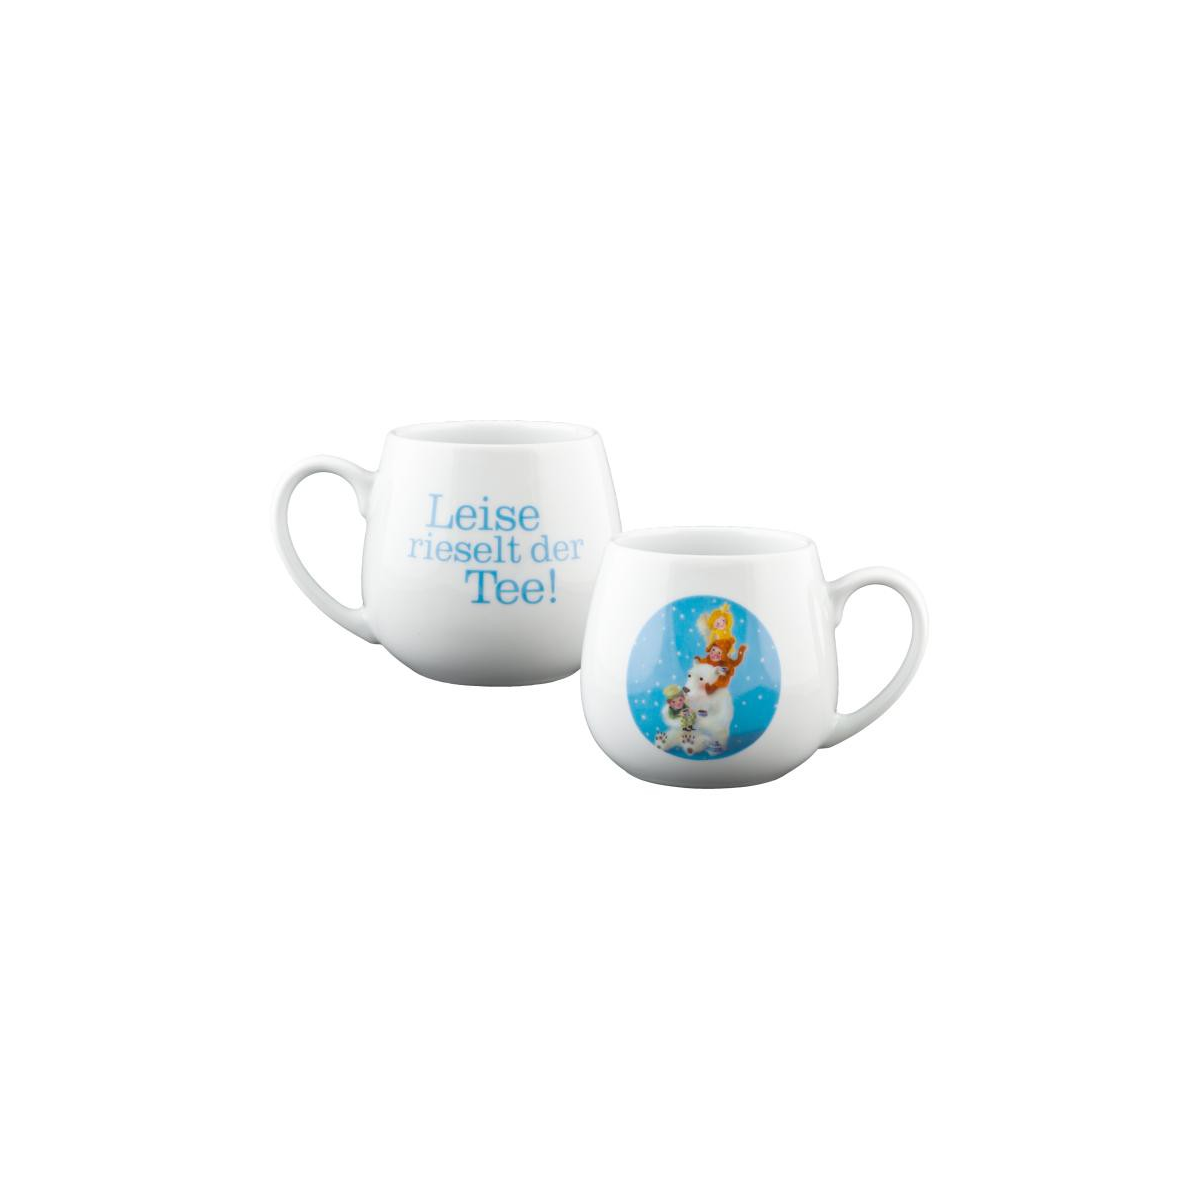 Leise rieselt der Tee-Becher, 420 ml